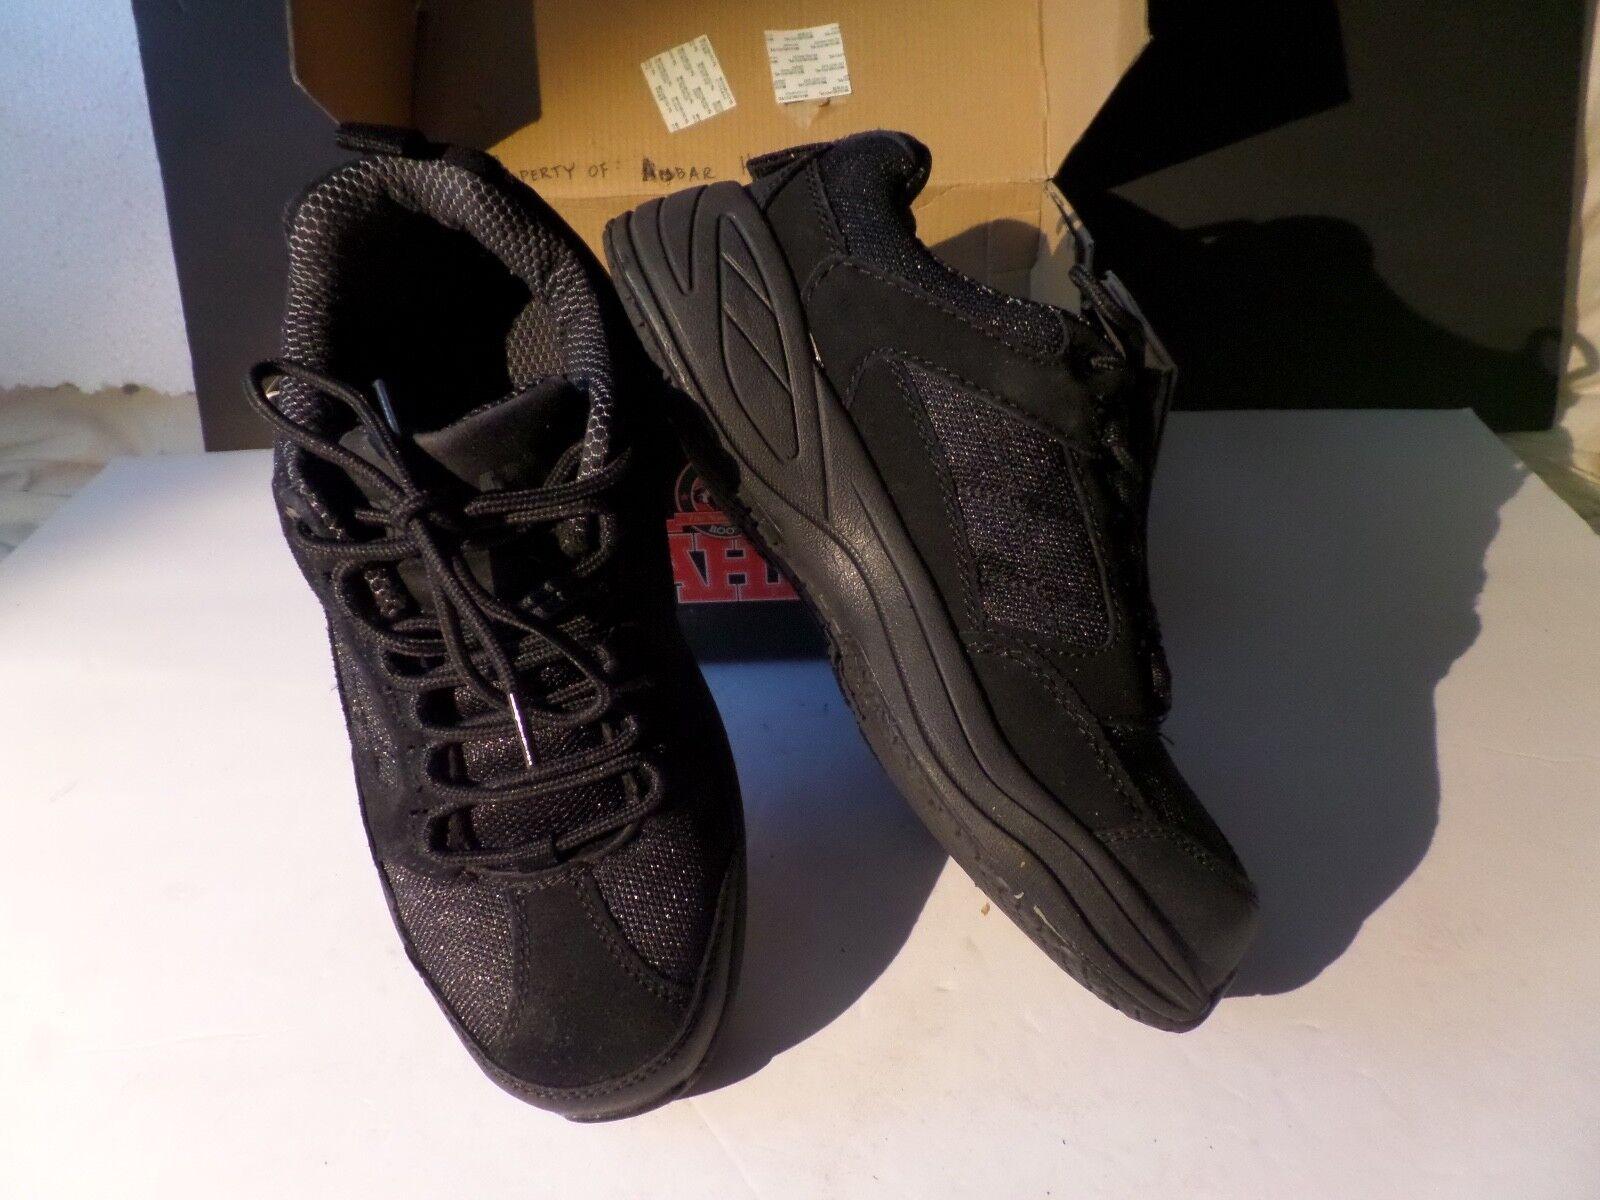 BRAHMA Adan Steel Toe Black Suede Work Industrial shoes Men's  7